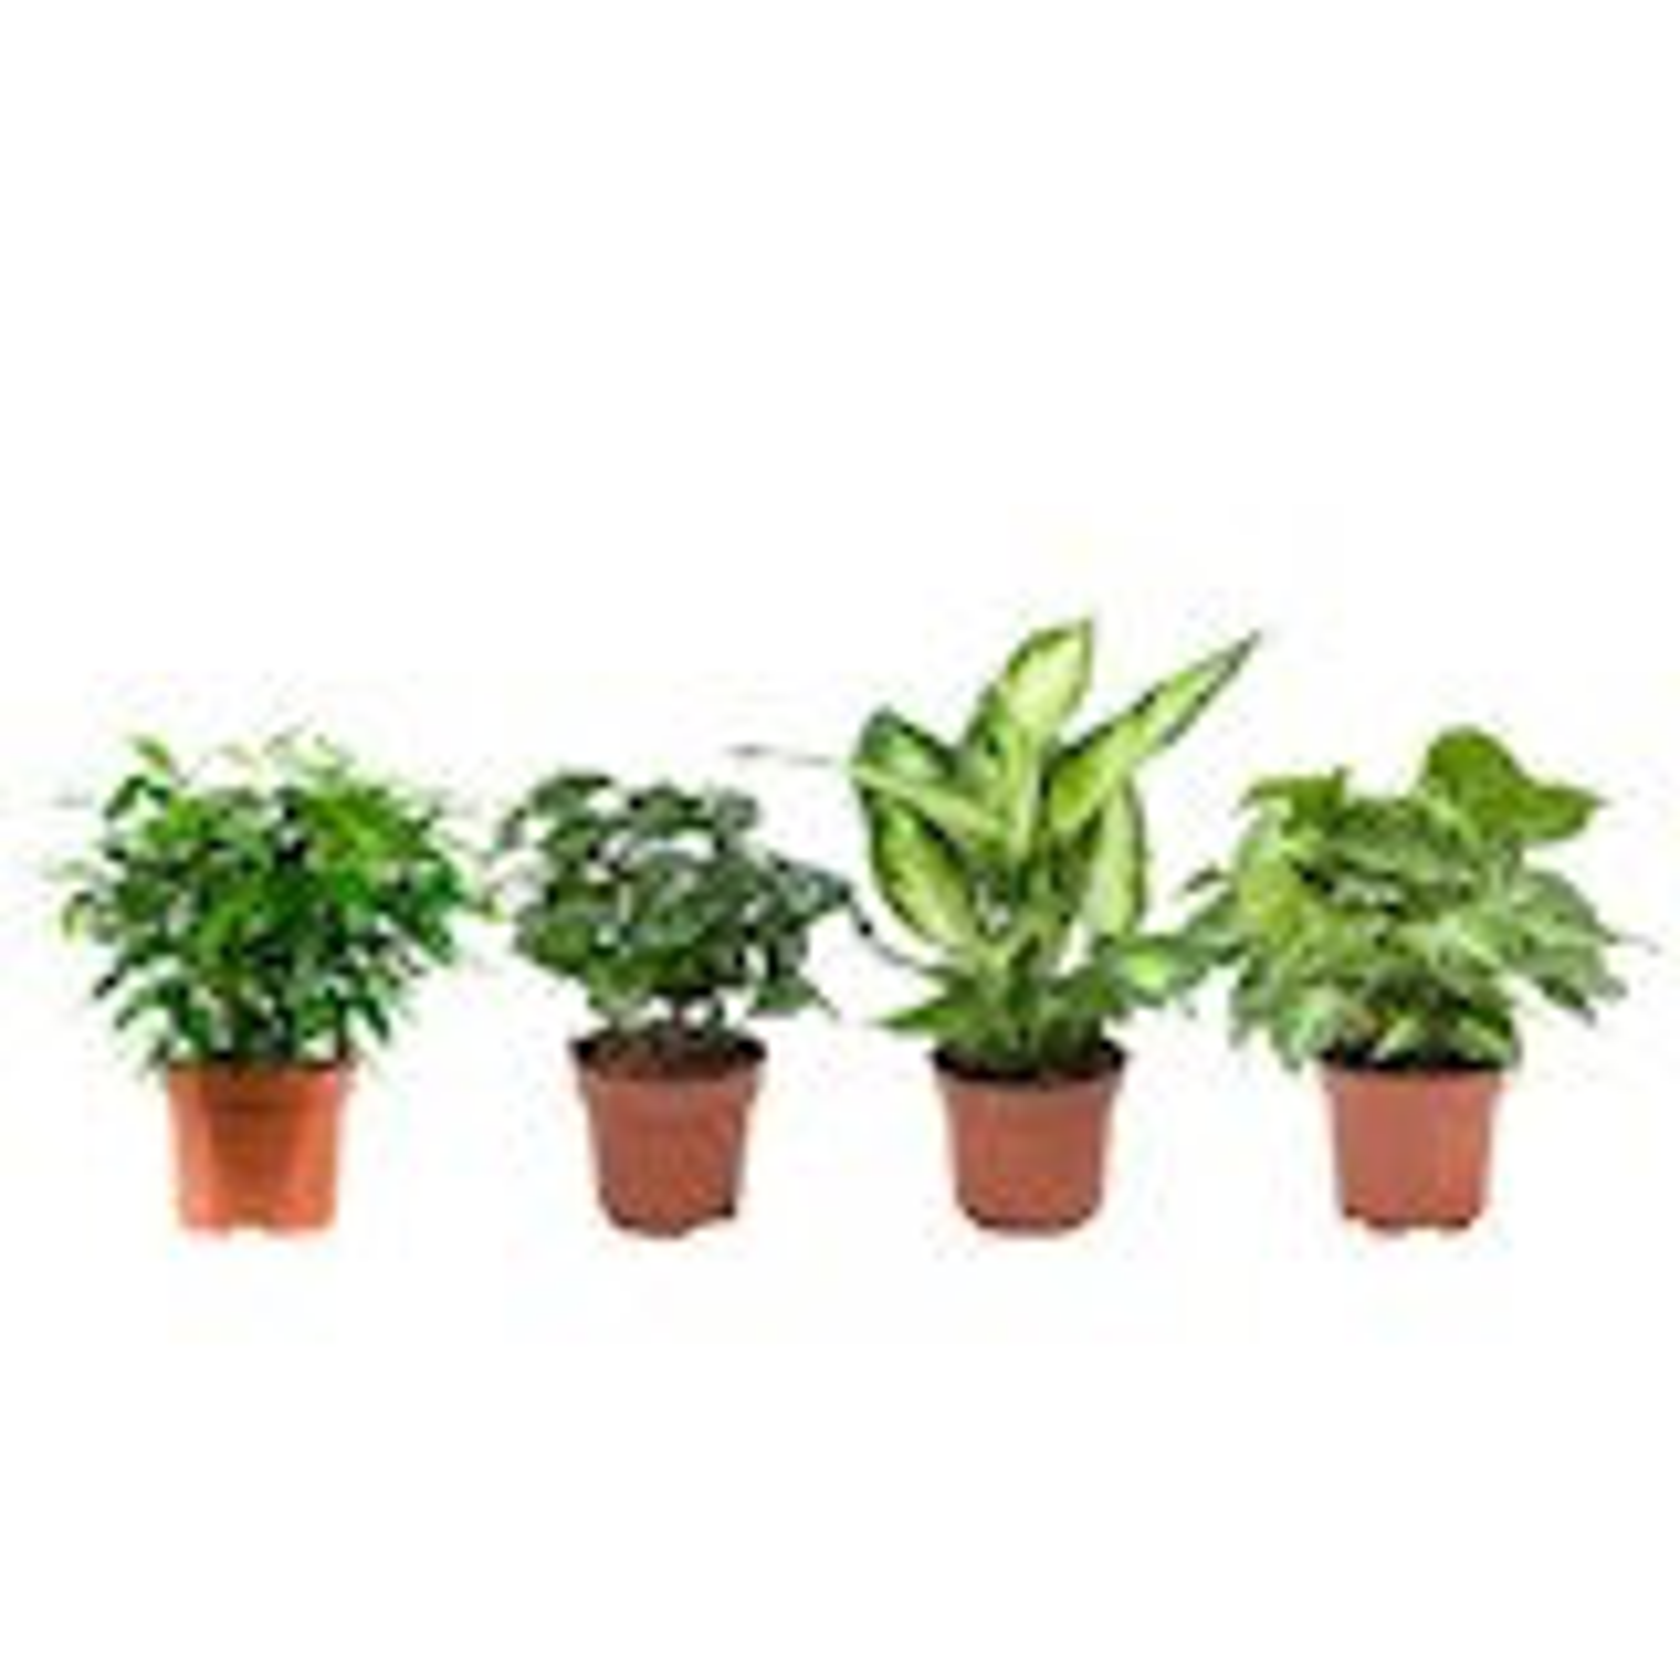 4 stuks Dieffenbachia Camilla, Coffea Arabica (Koffieplant), Syngonium Podophyllum, Ficus benjamina - pot 12cm - hoogte 25cm